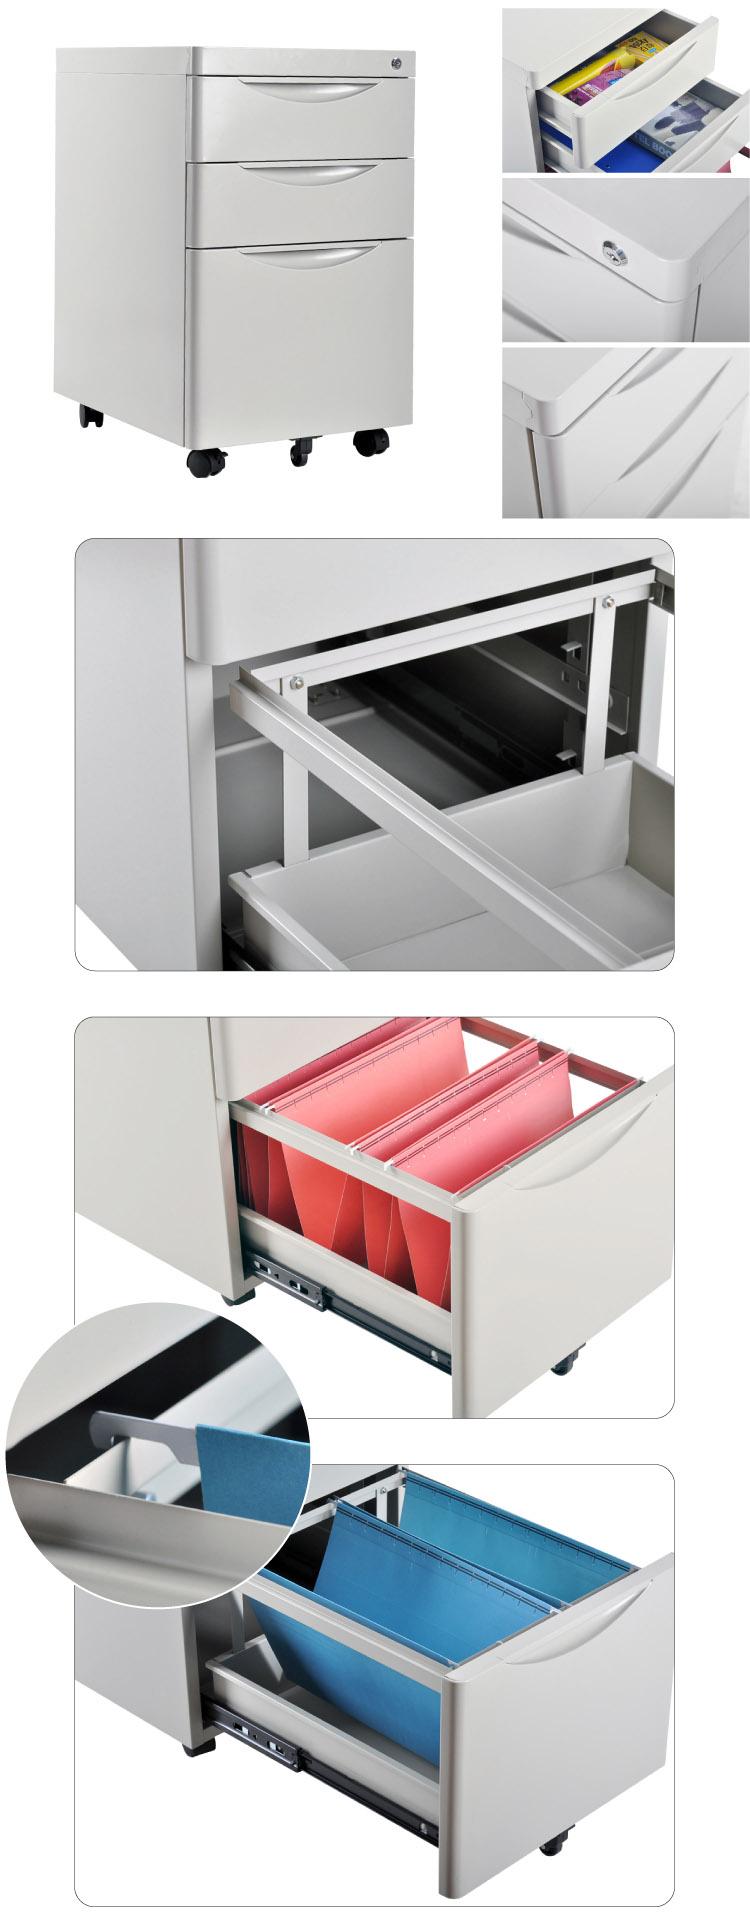 Mobile Cabinet Workforce Cabinet Sample Storage Cabinet Yd-d003-a ...